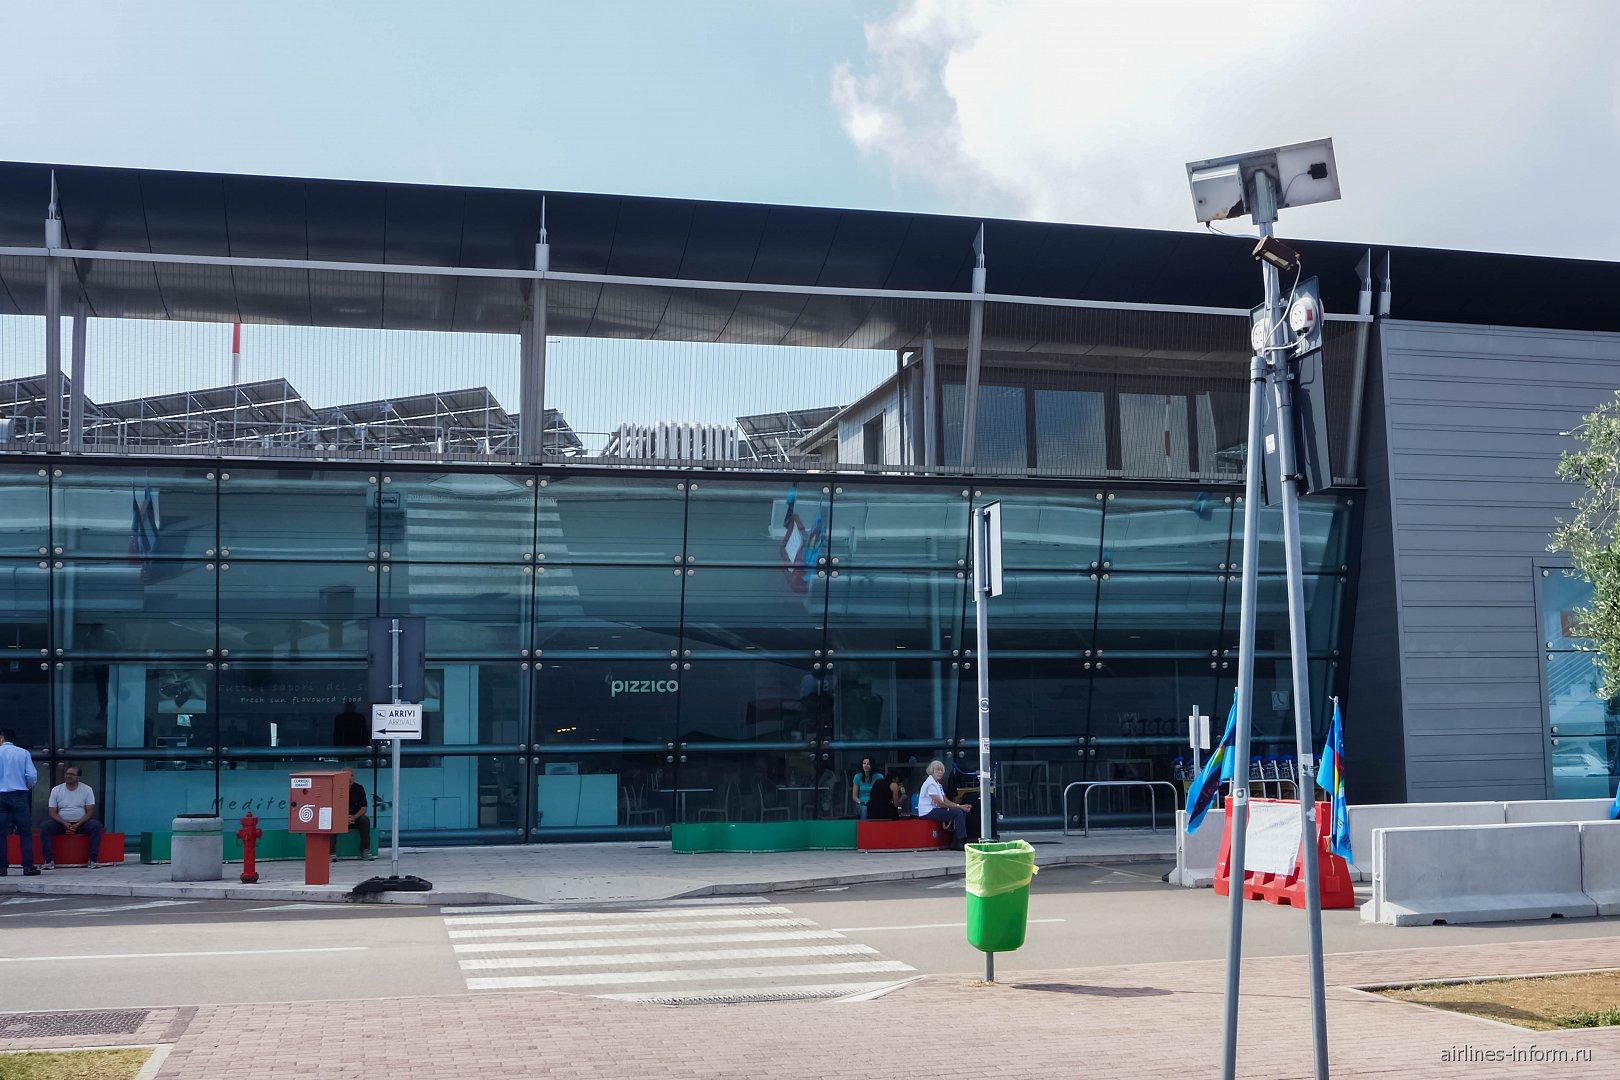 Фрагмент пассажирского терминала аэропорта Бриндизи